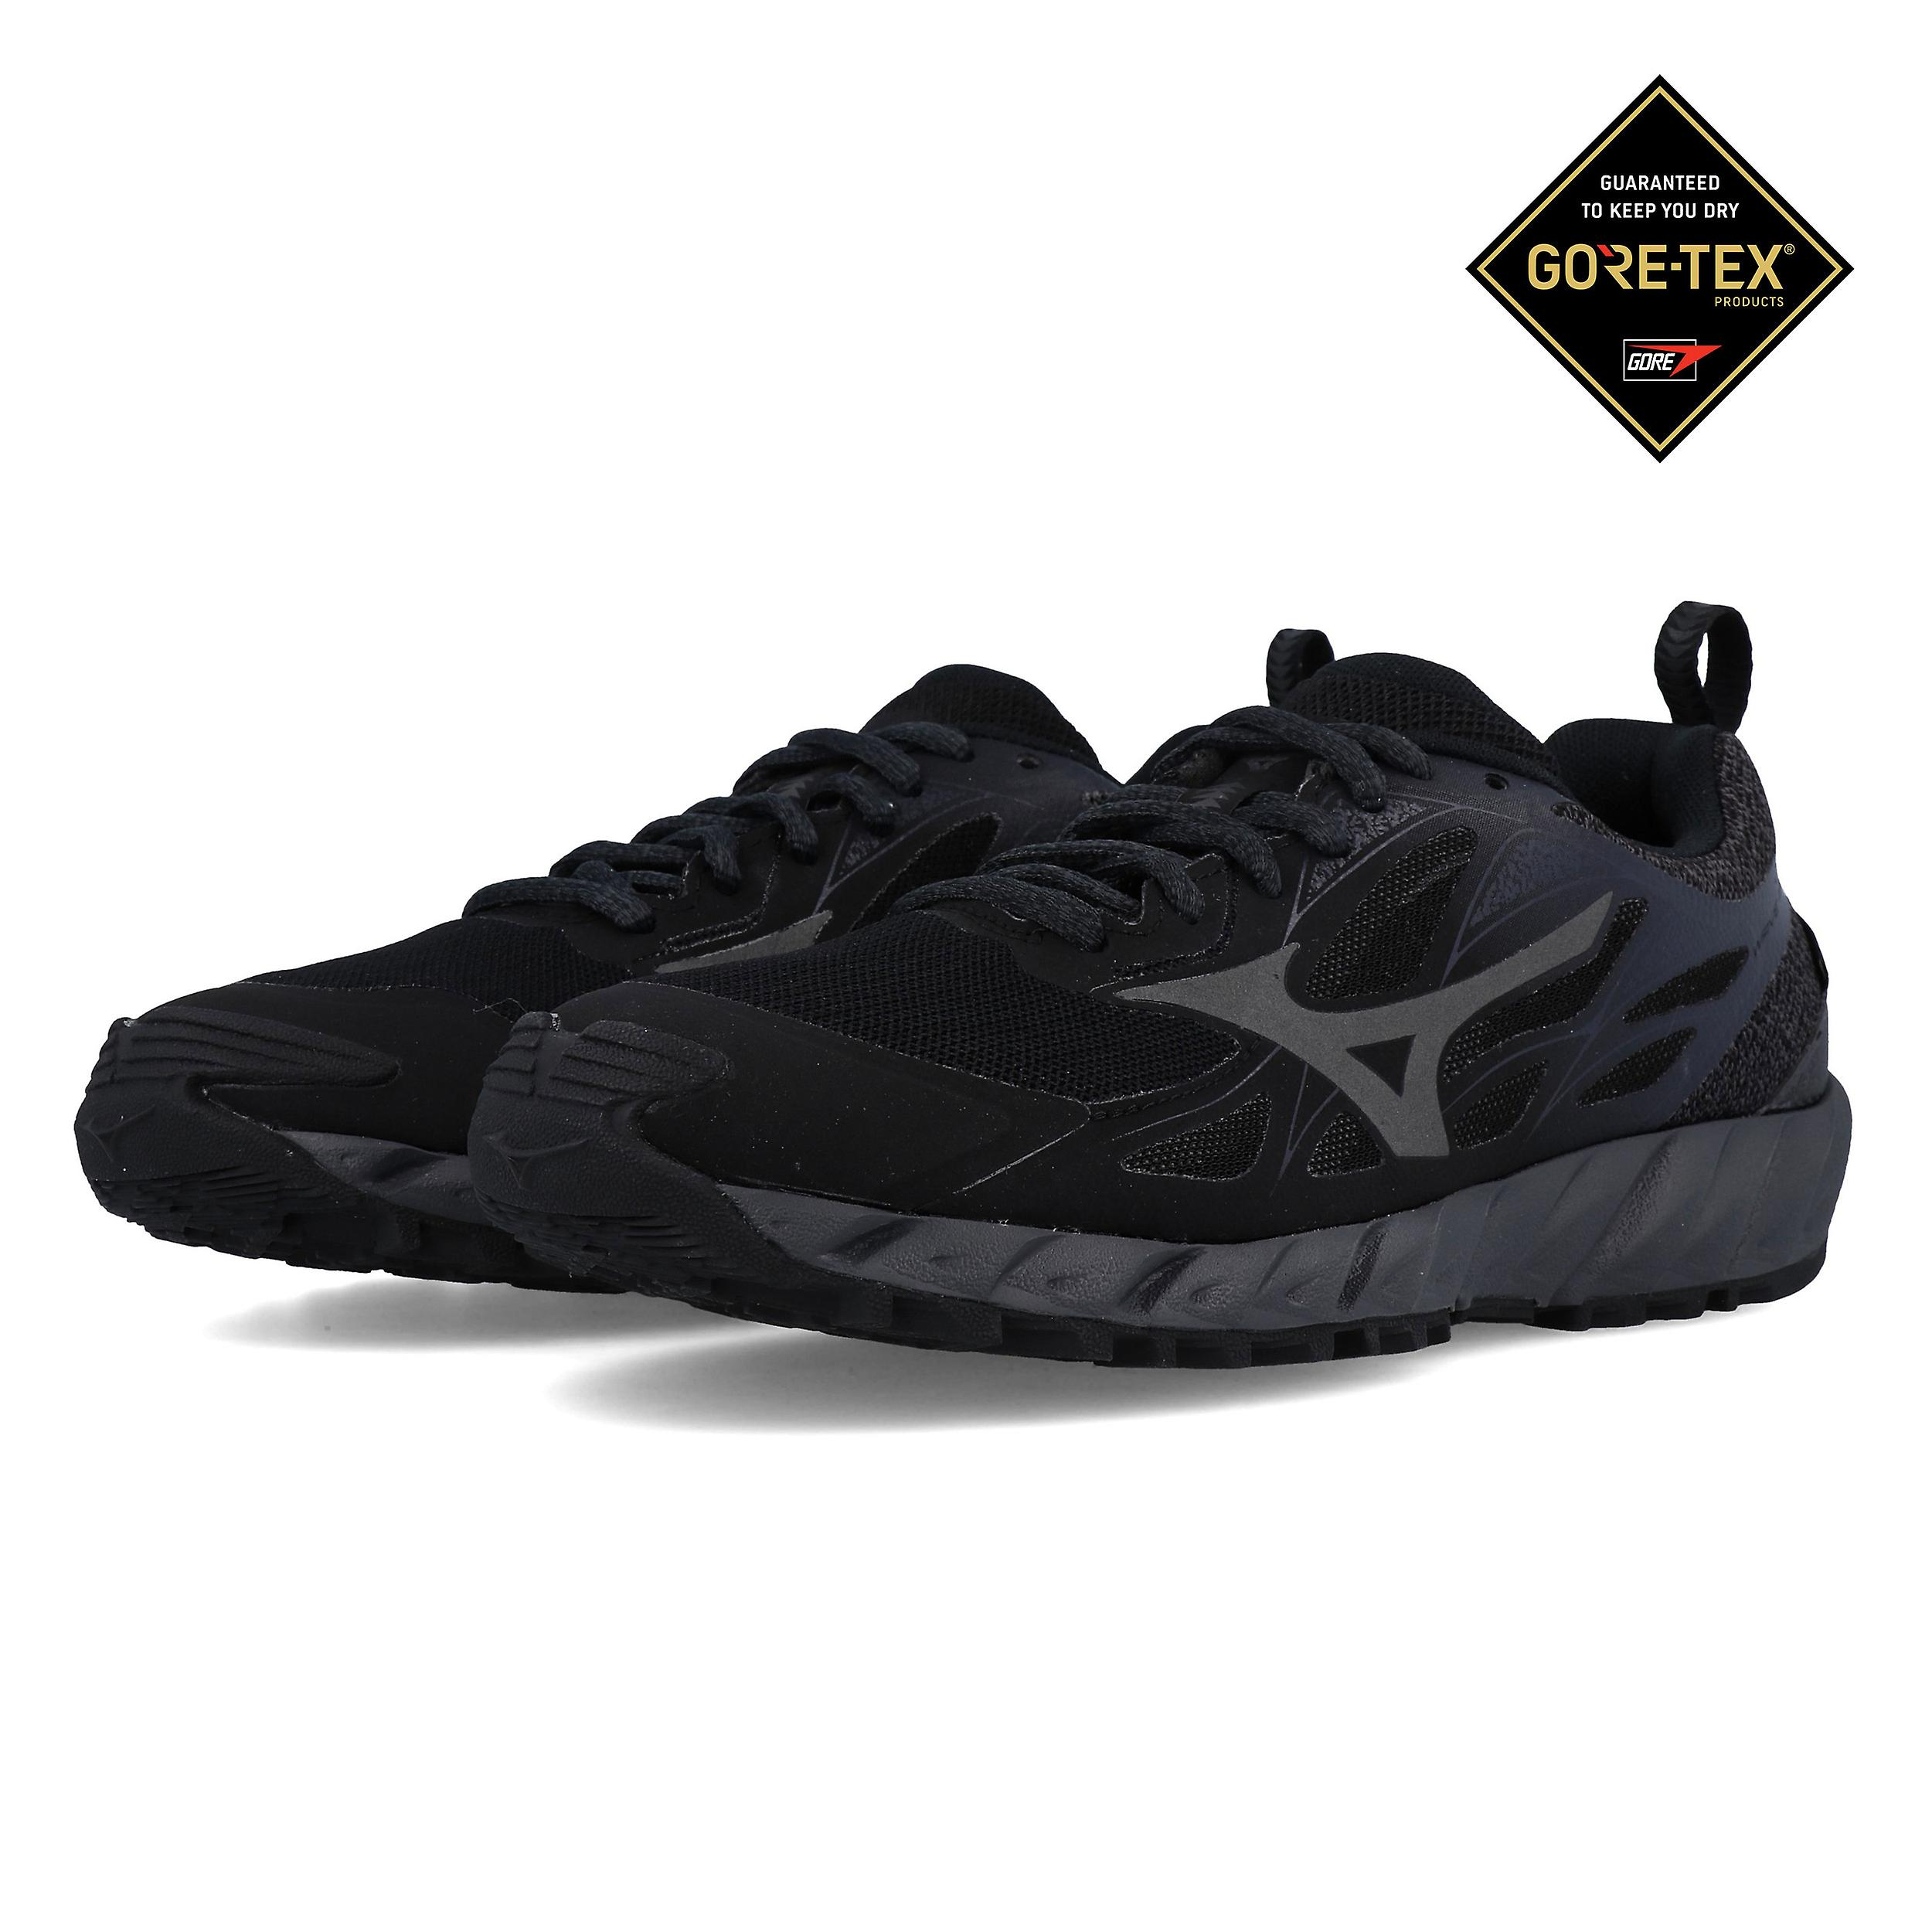 GORE-TEX Women's Trail Running Shoes